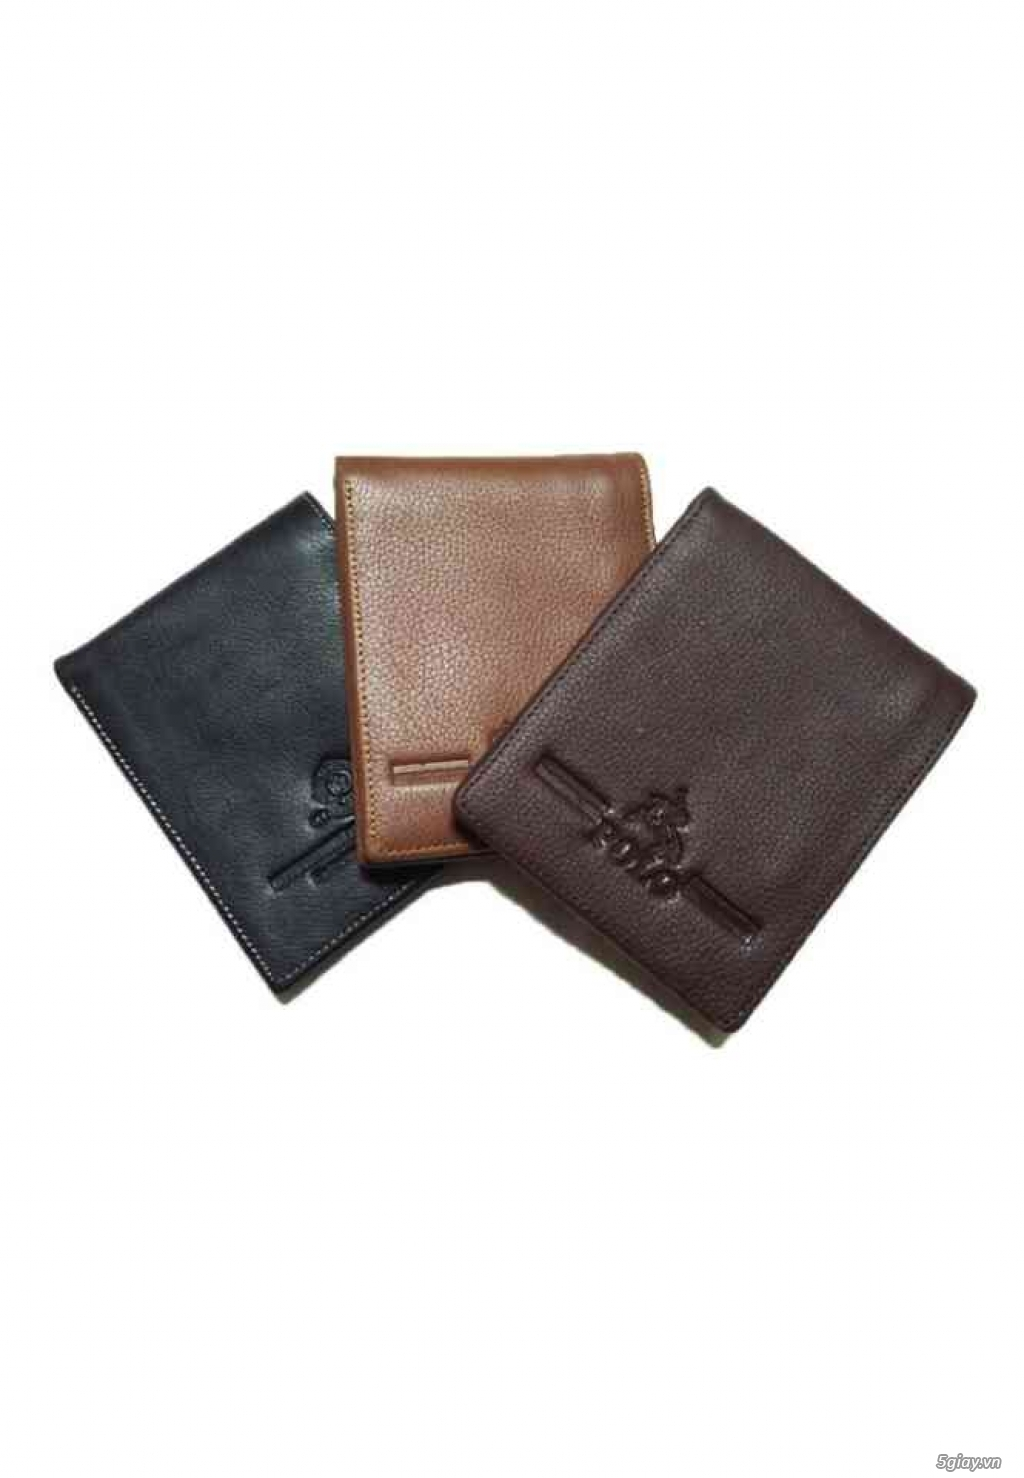 Khai Trương Shop Bóp Ví, Thắt Lưng Da Leather Wolrd Big Sale 30% - 23